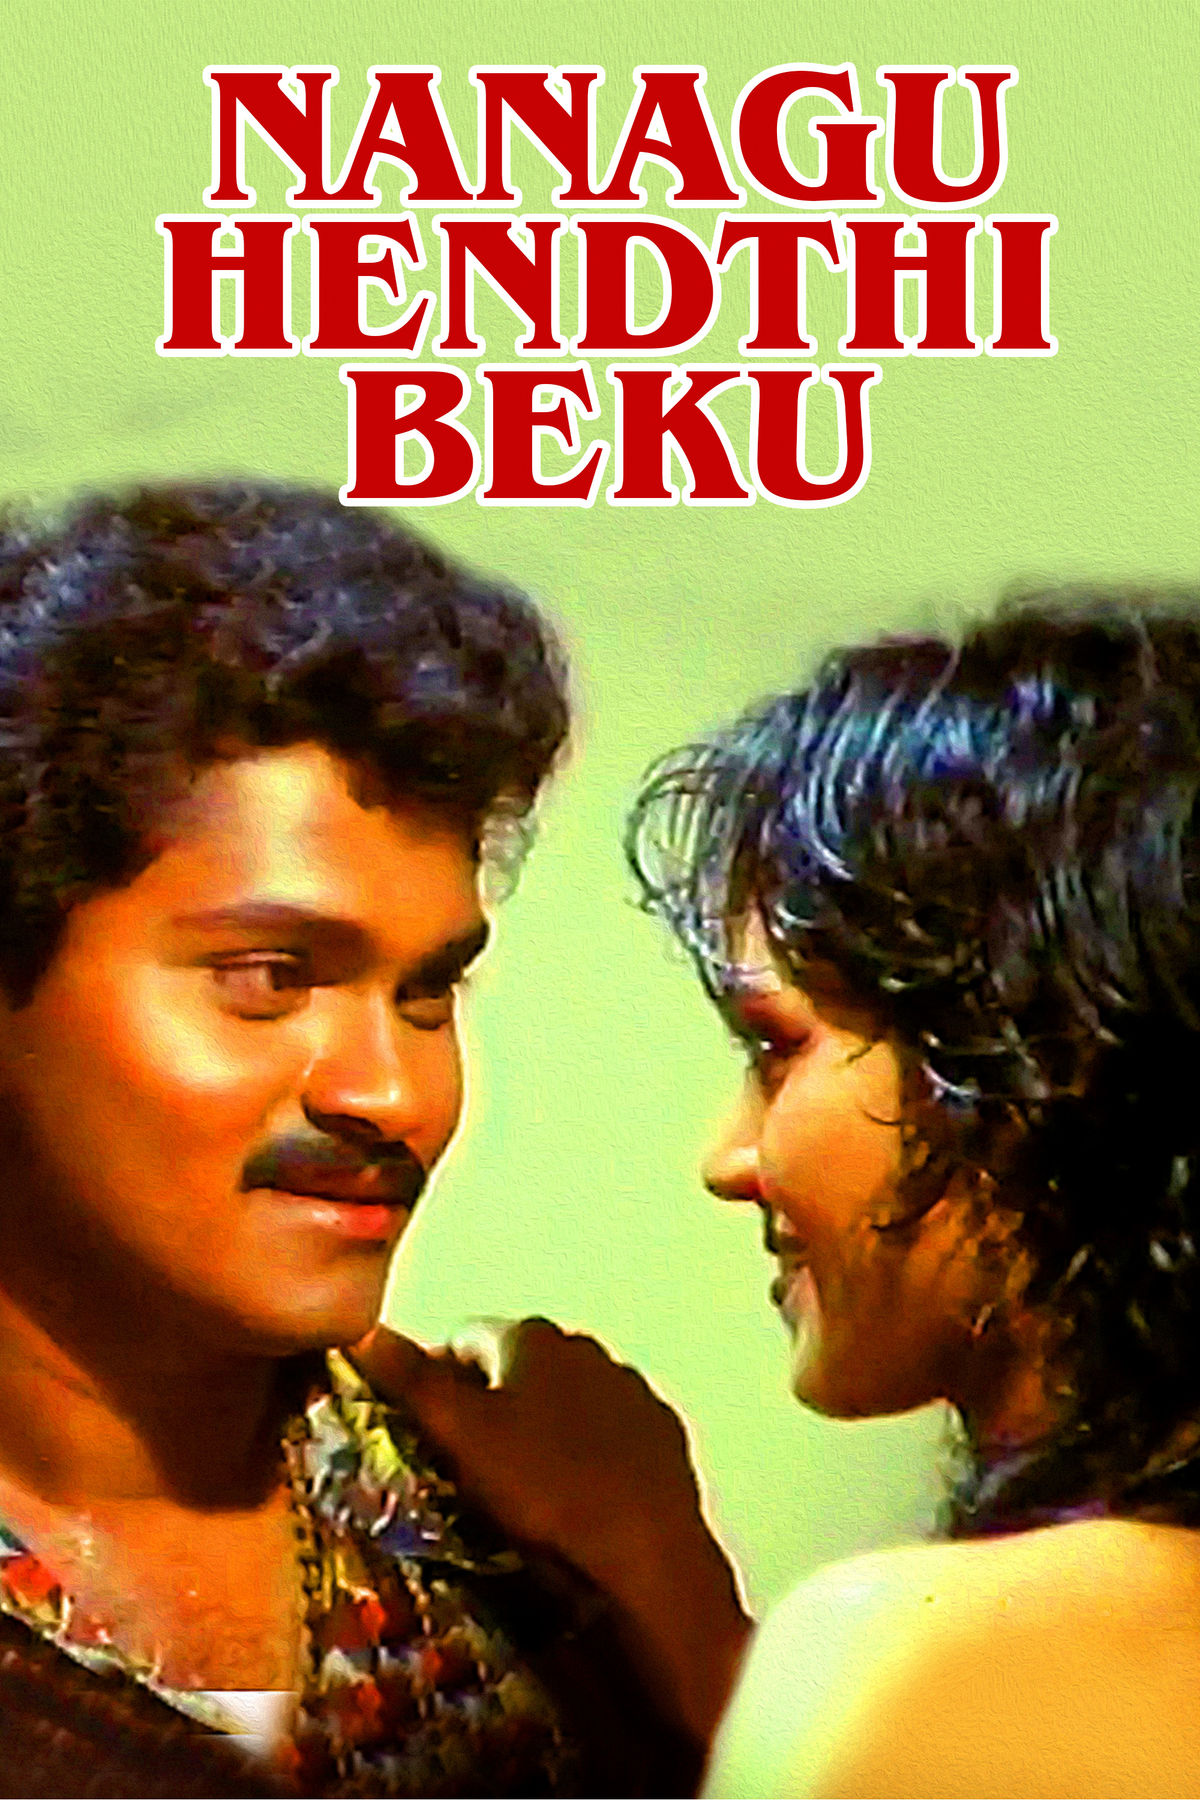 Shivaranjini Best Movies, TV Shows and Web Series List